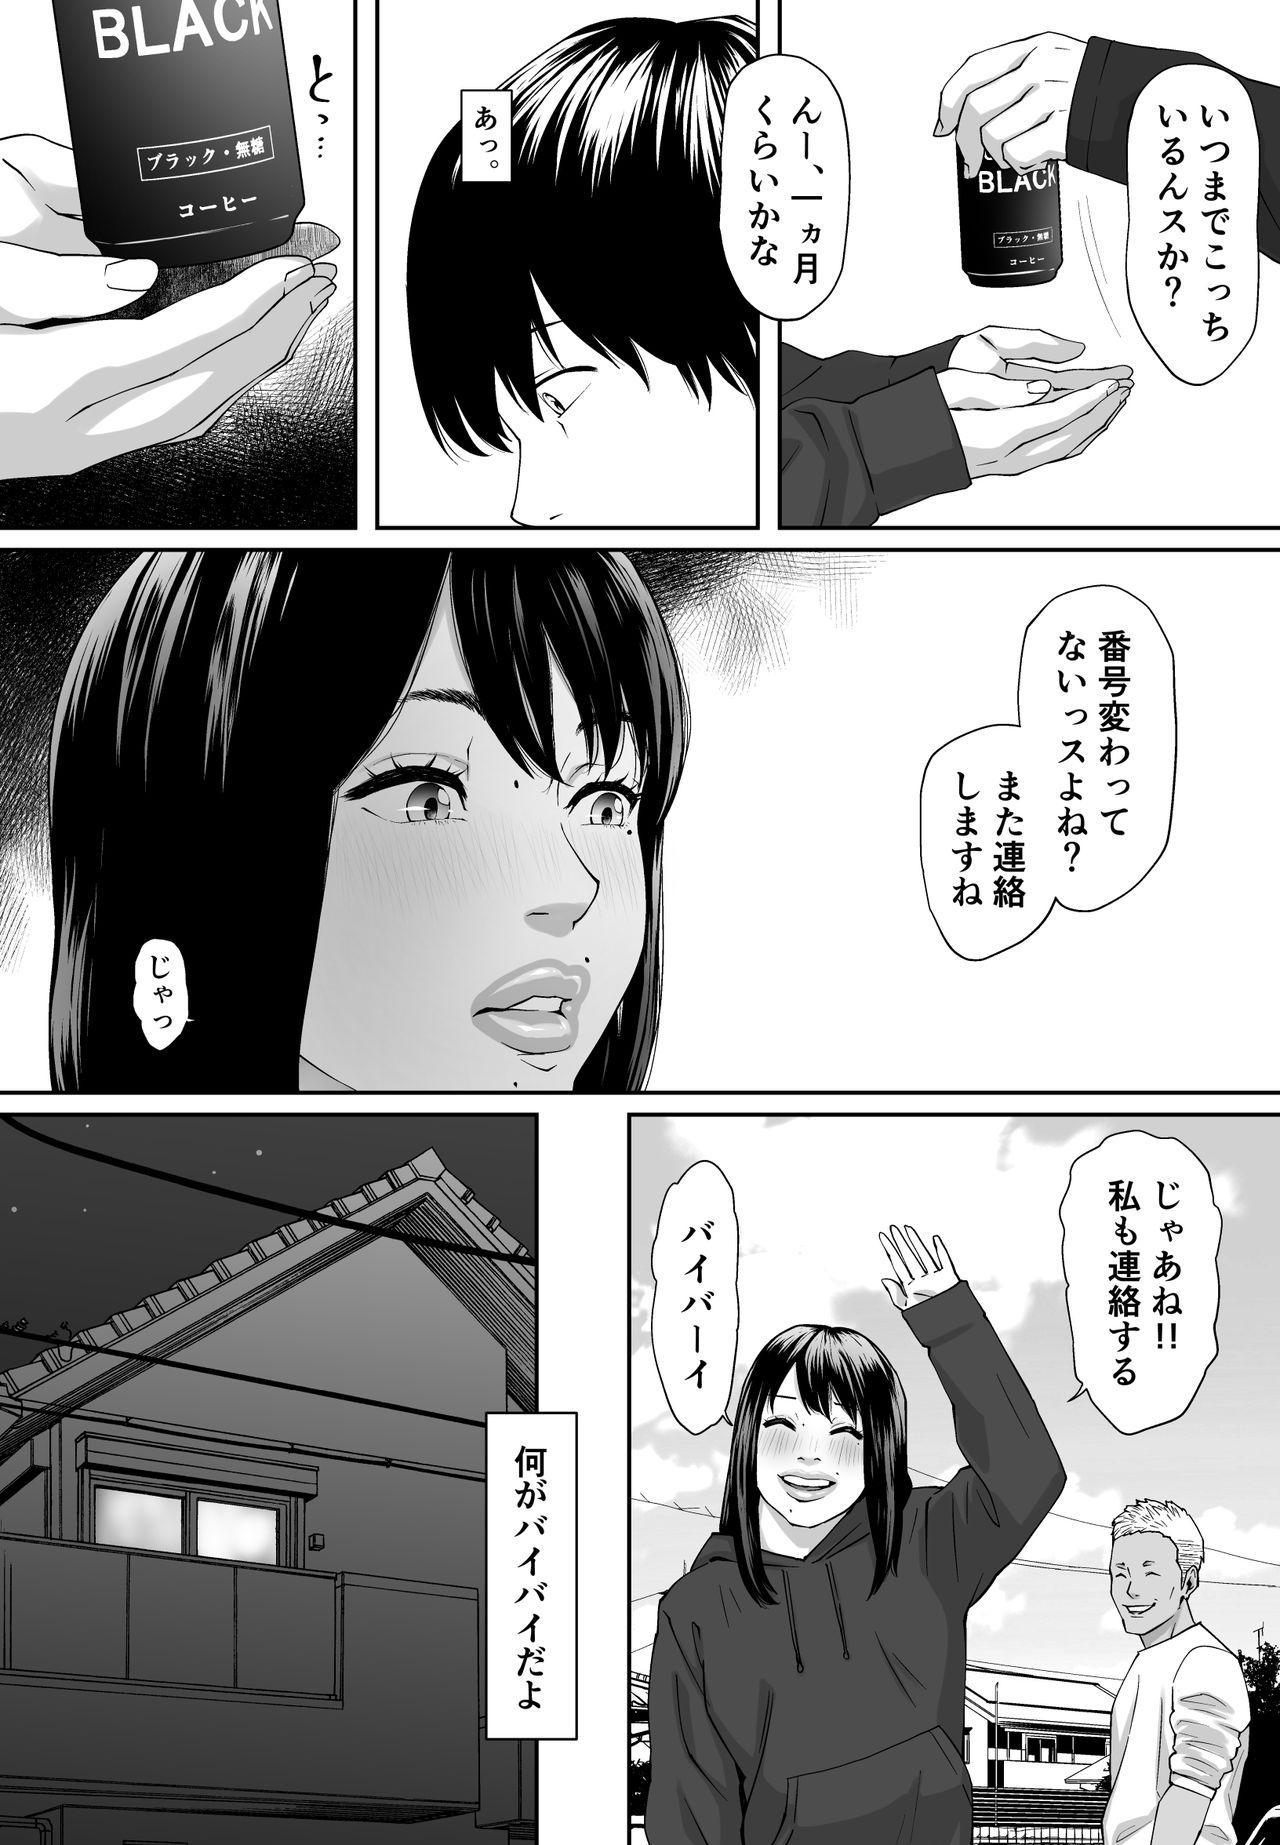 Mild Hentai NANA 4